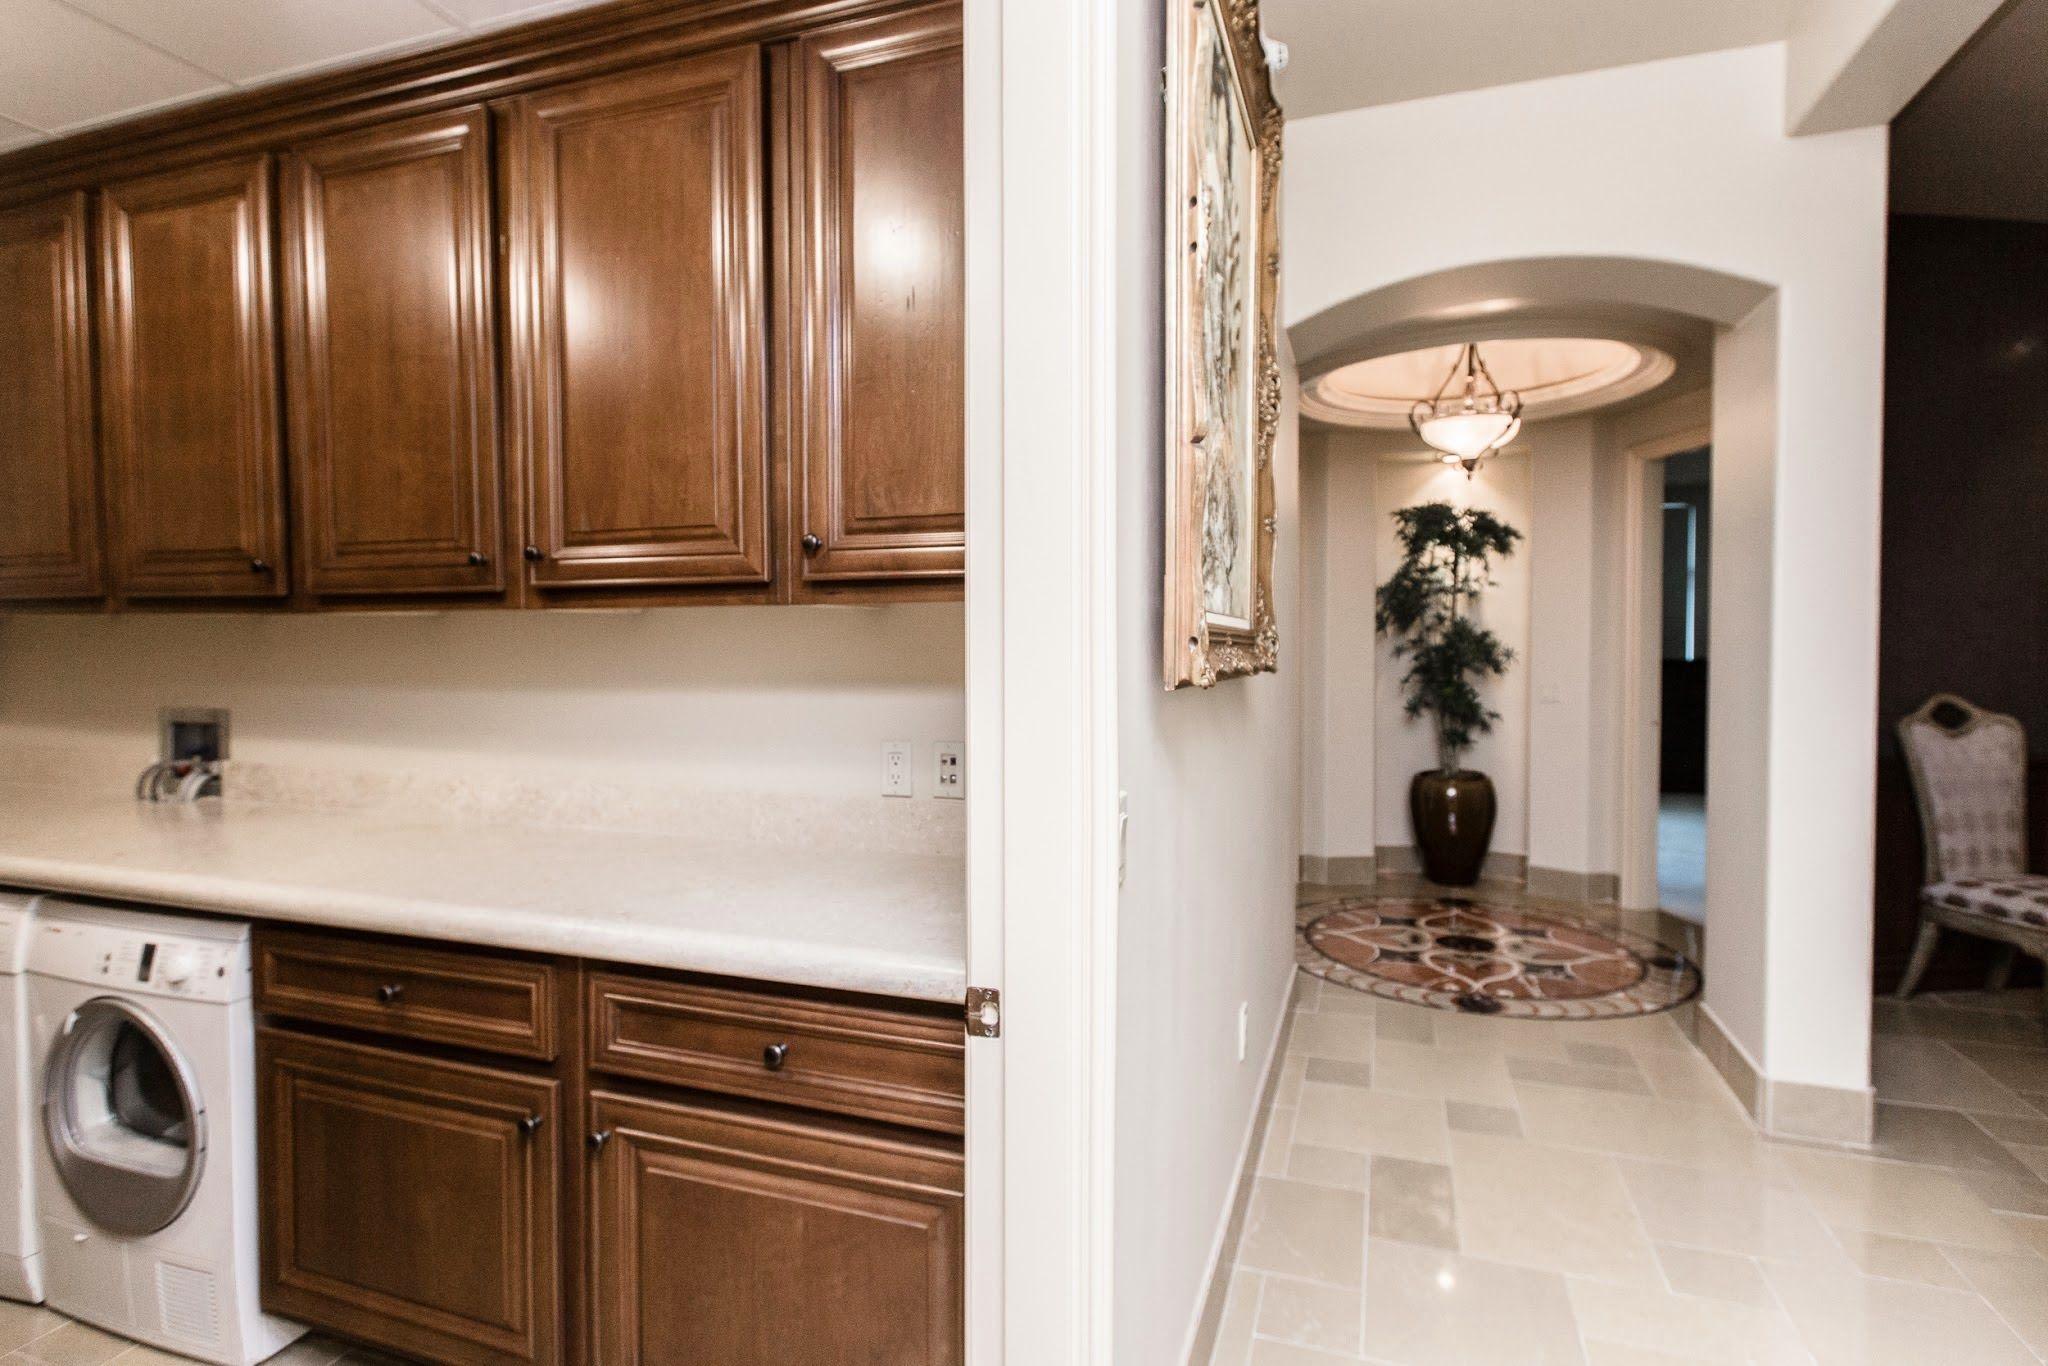 Luxury Homes for Sale in Las Vegas | Luxury homes, Home ...